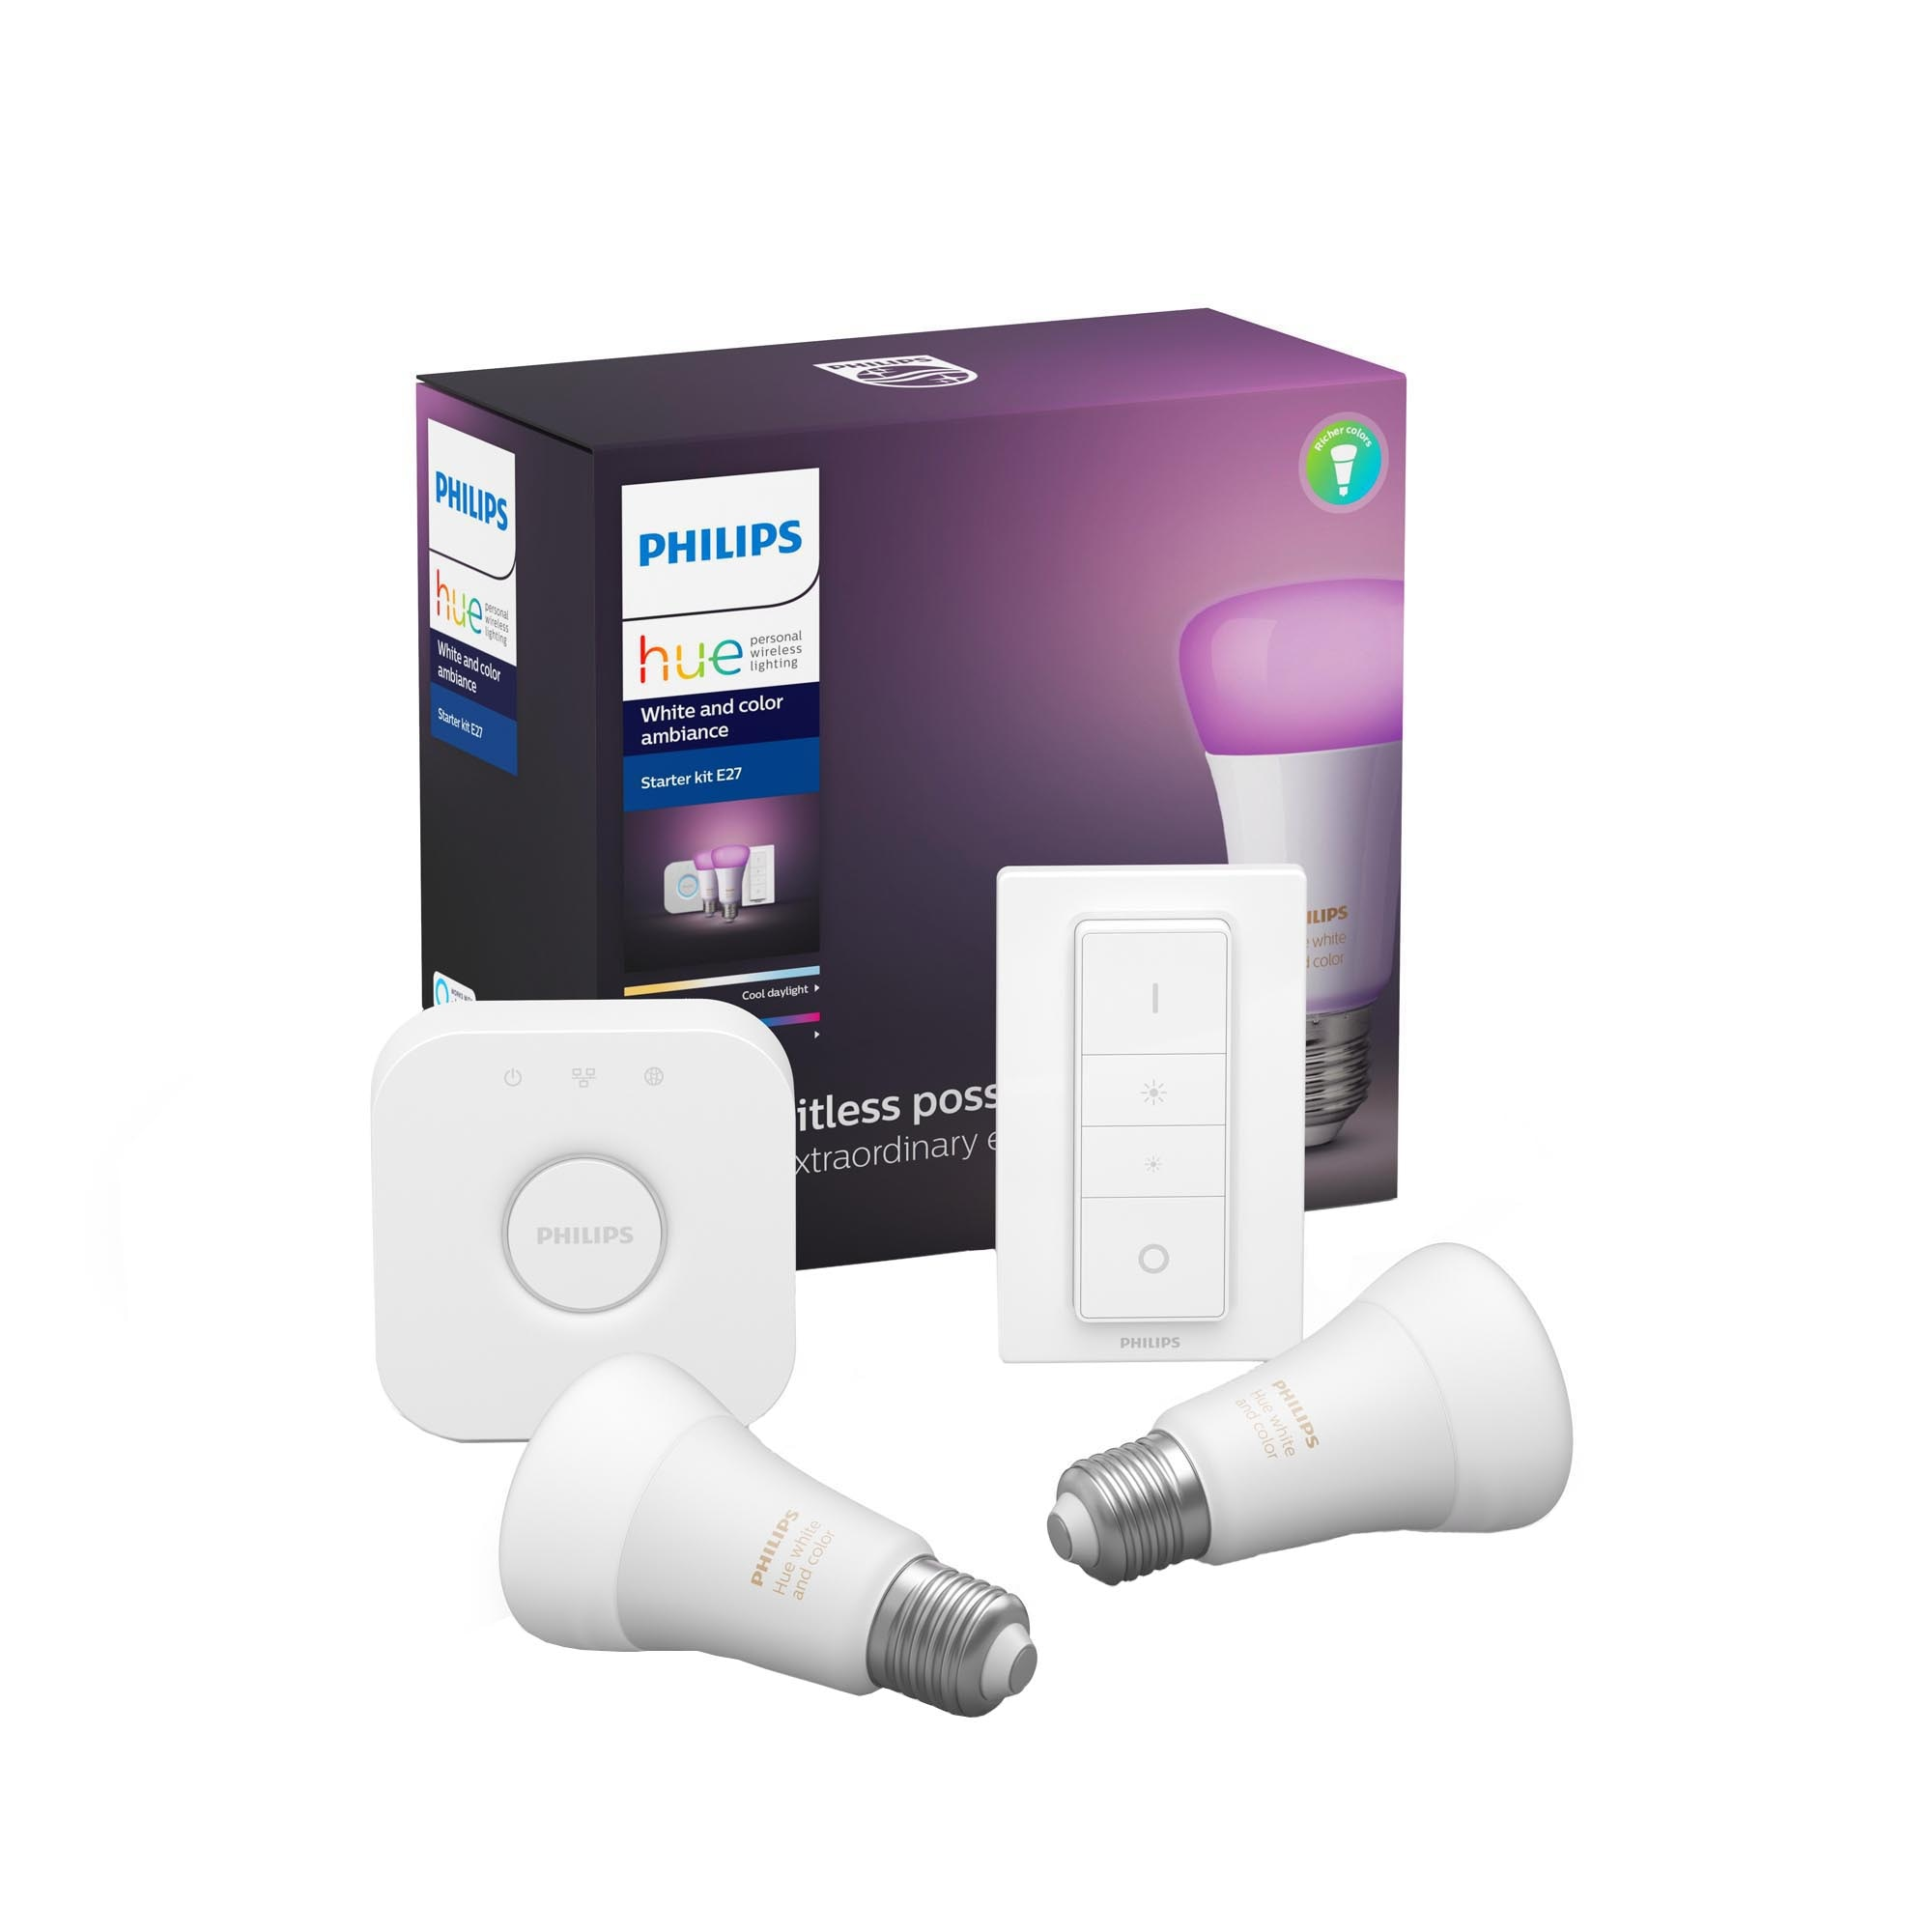 Fotografie Pachet 2 becuri inteligente LED RGB Philips Hue ambianta alba/color, WiFi/Bluetooth , E27, 9W, 806 lm + Bridge si Variator